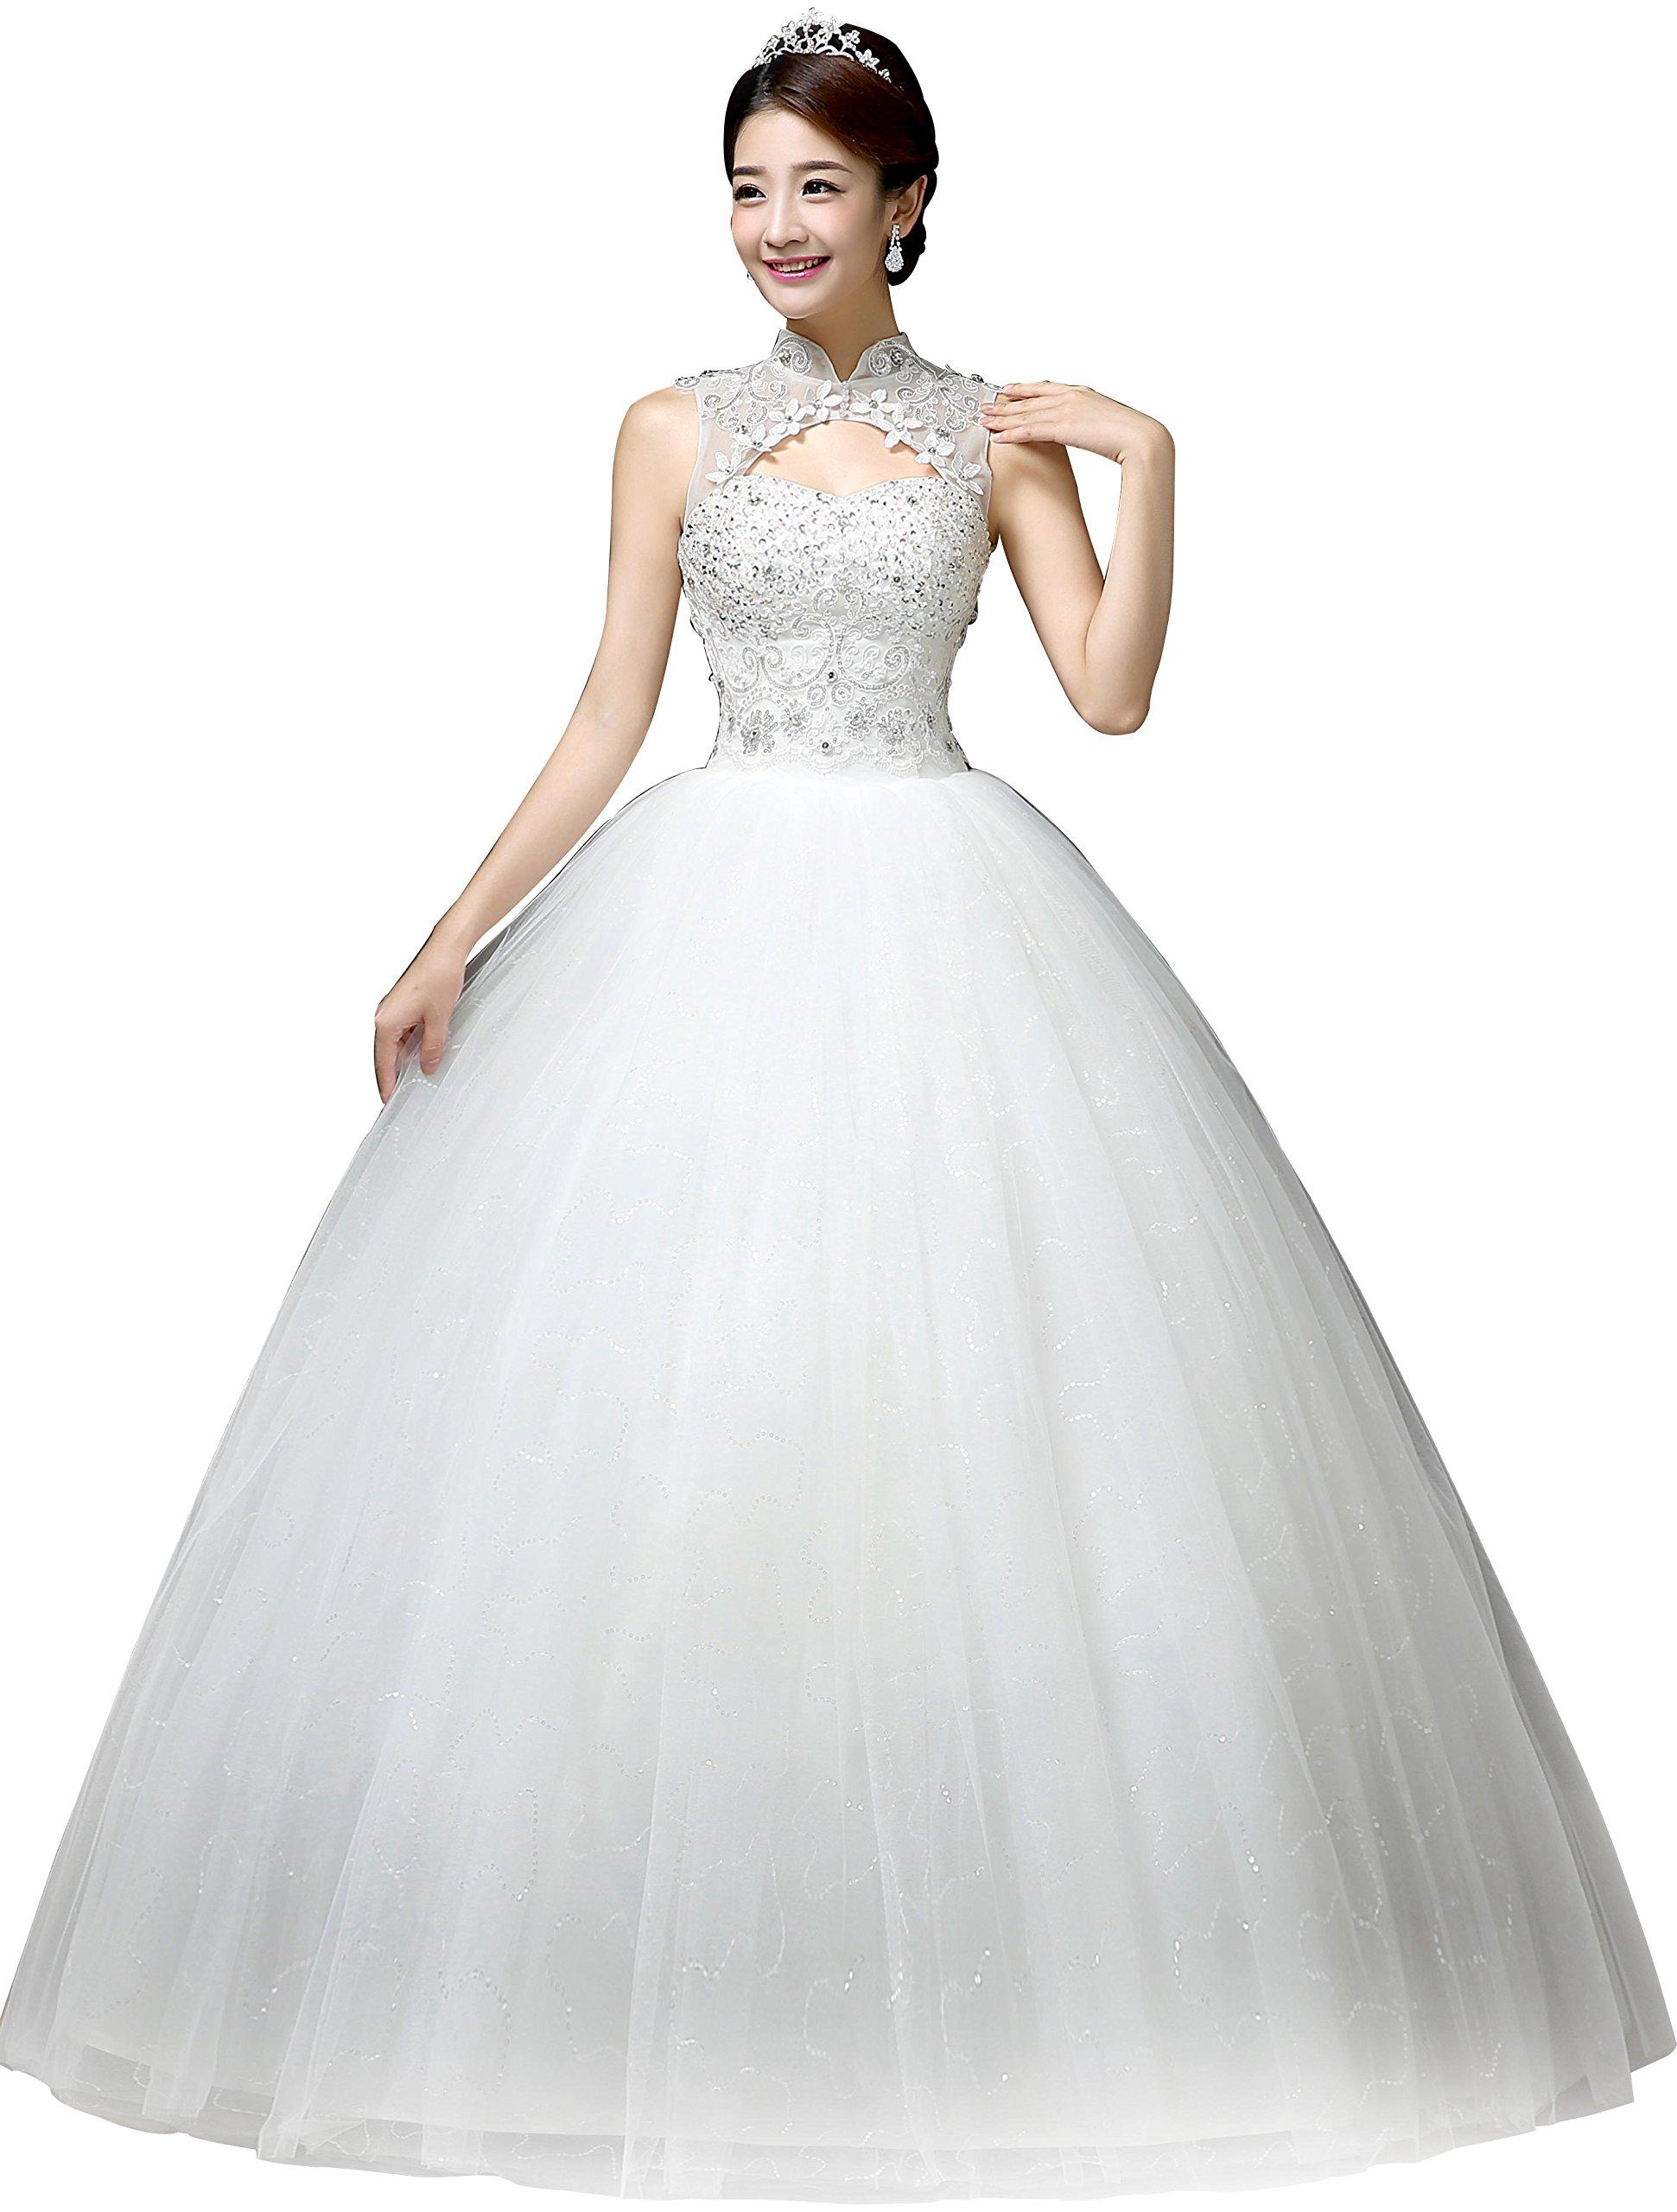 Clover Bridal Vintage High Collar Pearl Wedding Dress for